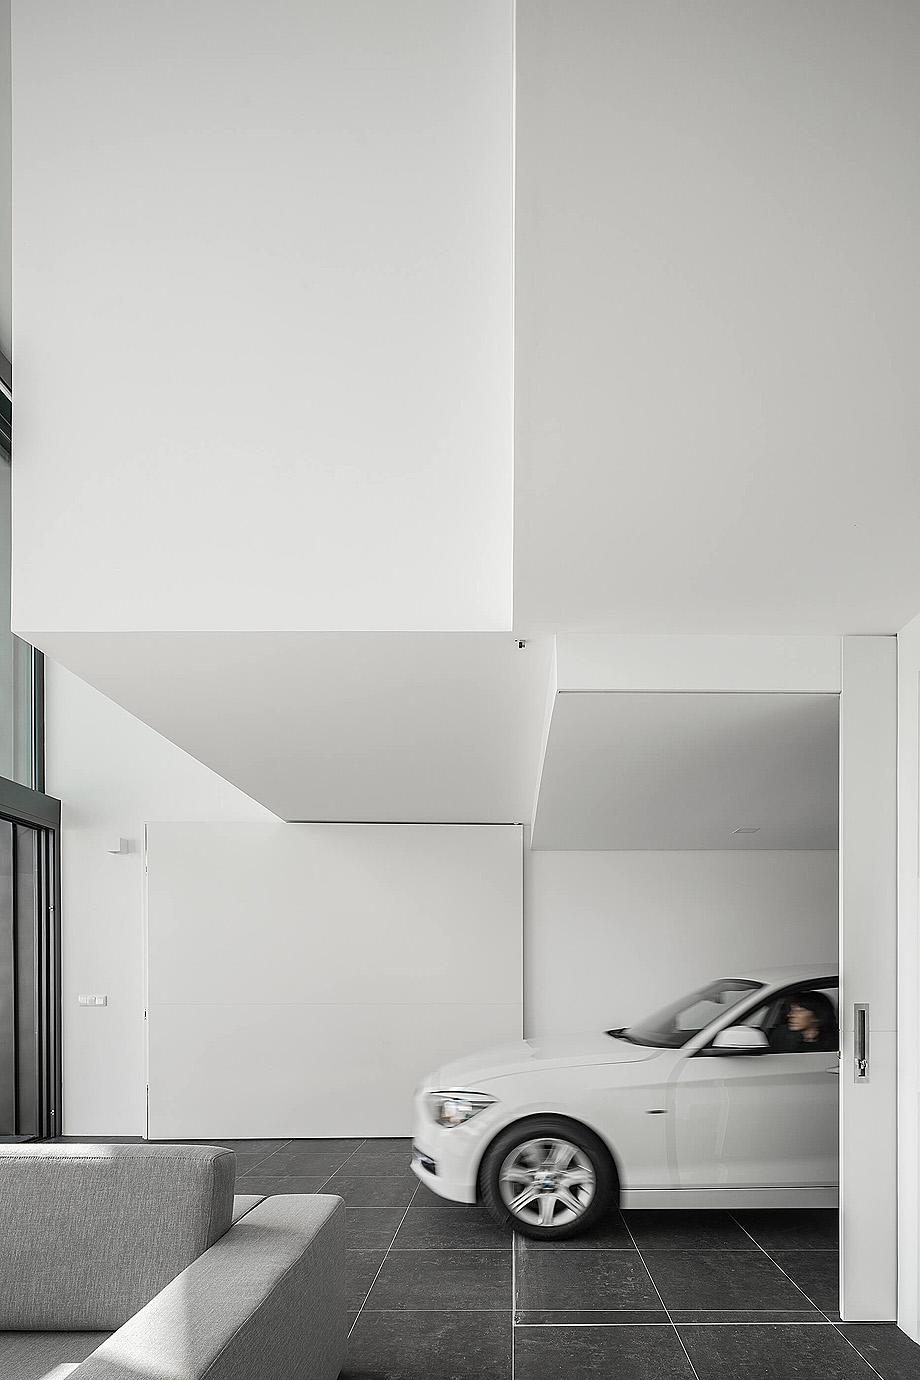 casa do arco de frari architecture network - foto ivo tavares (11)